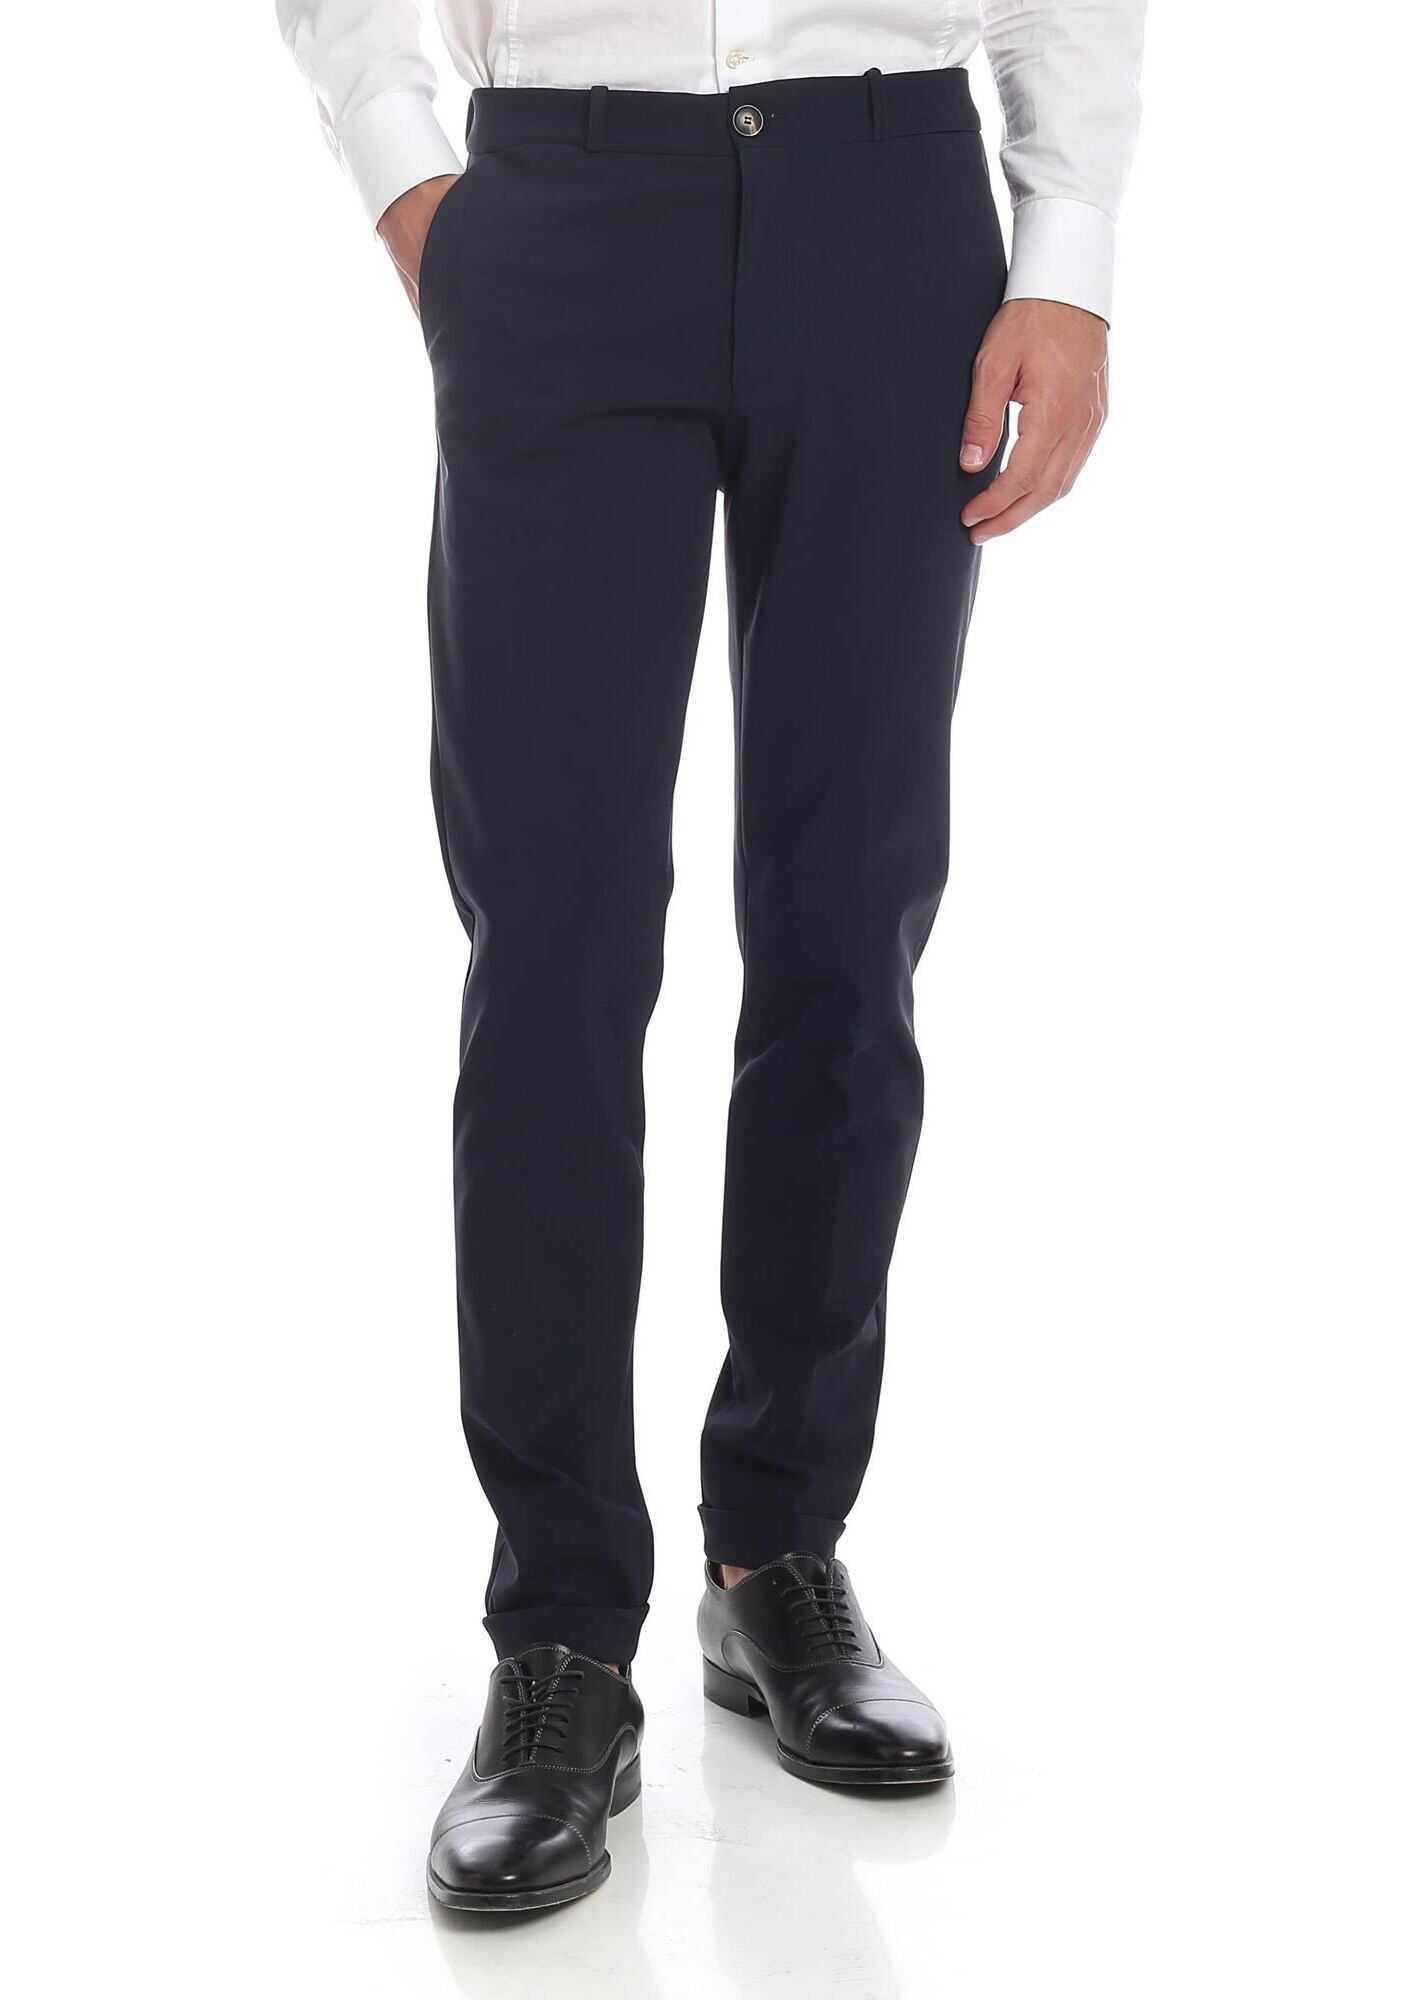 RRD Roberto Ricci Designs Winter Taz Trousers In Blue Blue imagine